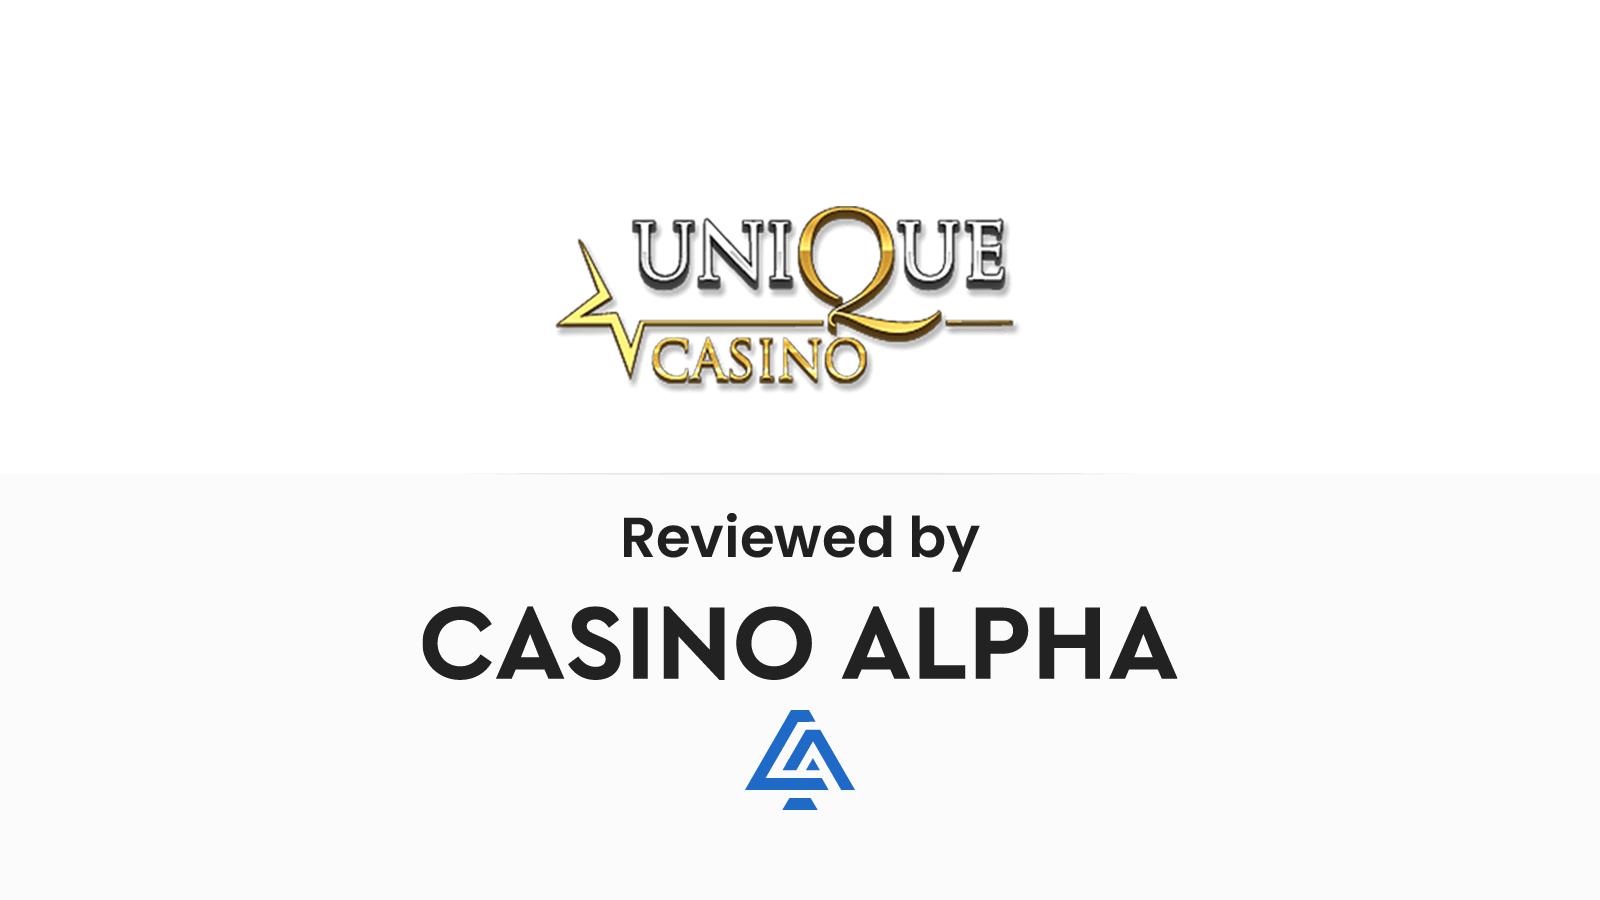 Unique Casino Review & Offers